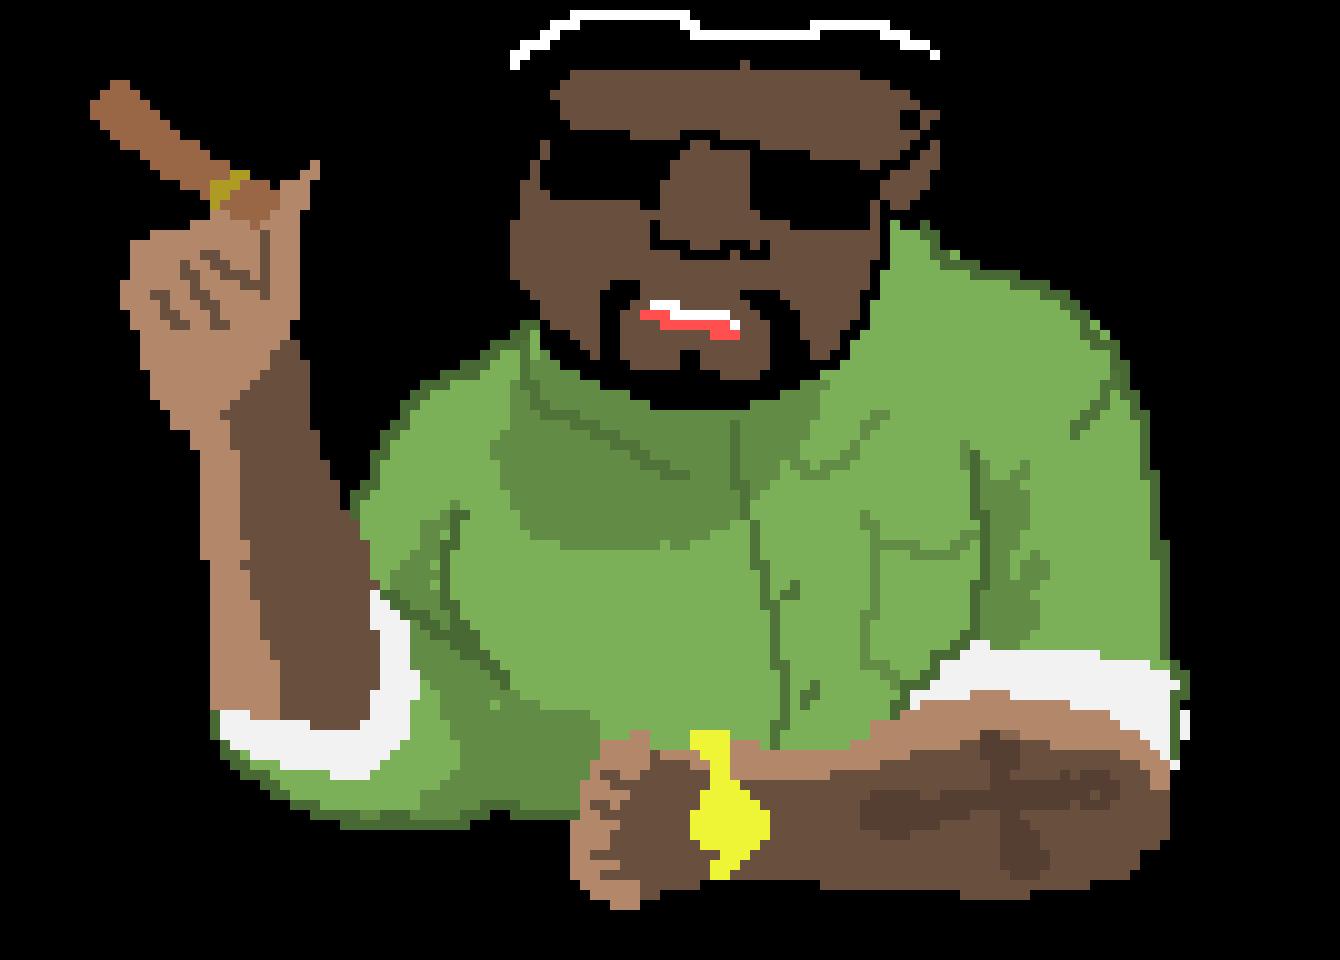 Big smoke png. Pixel art maker